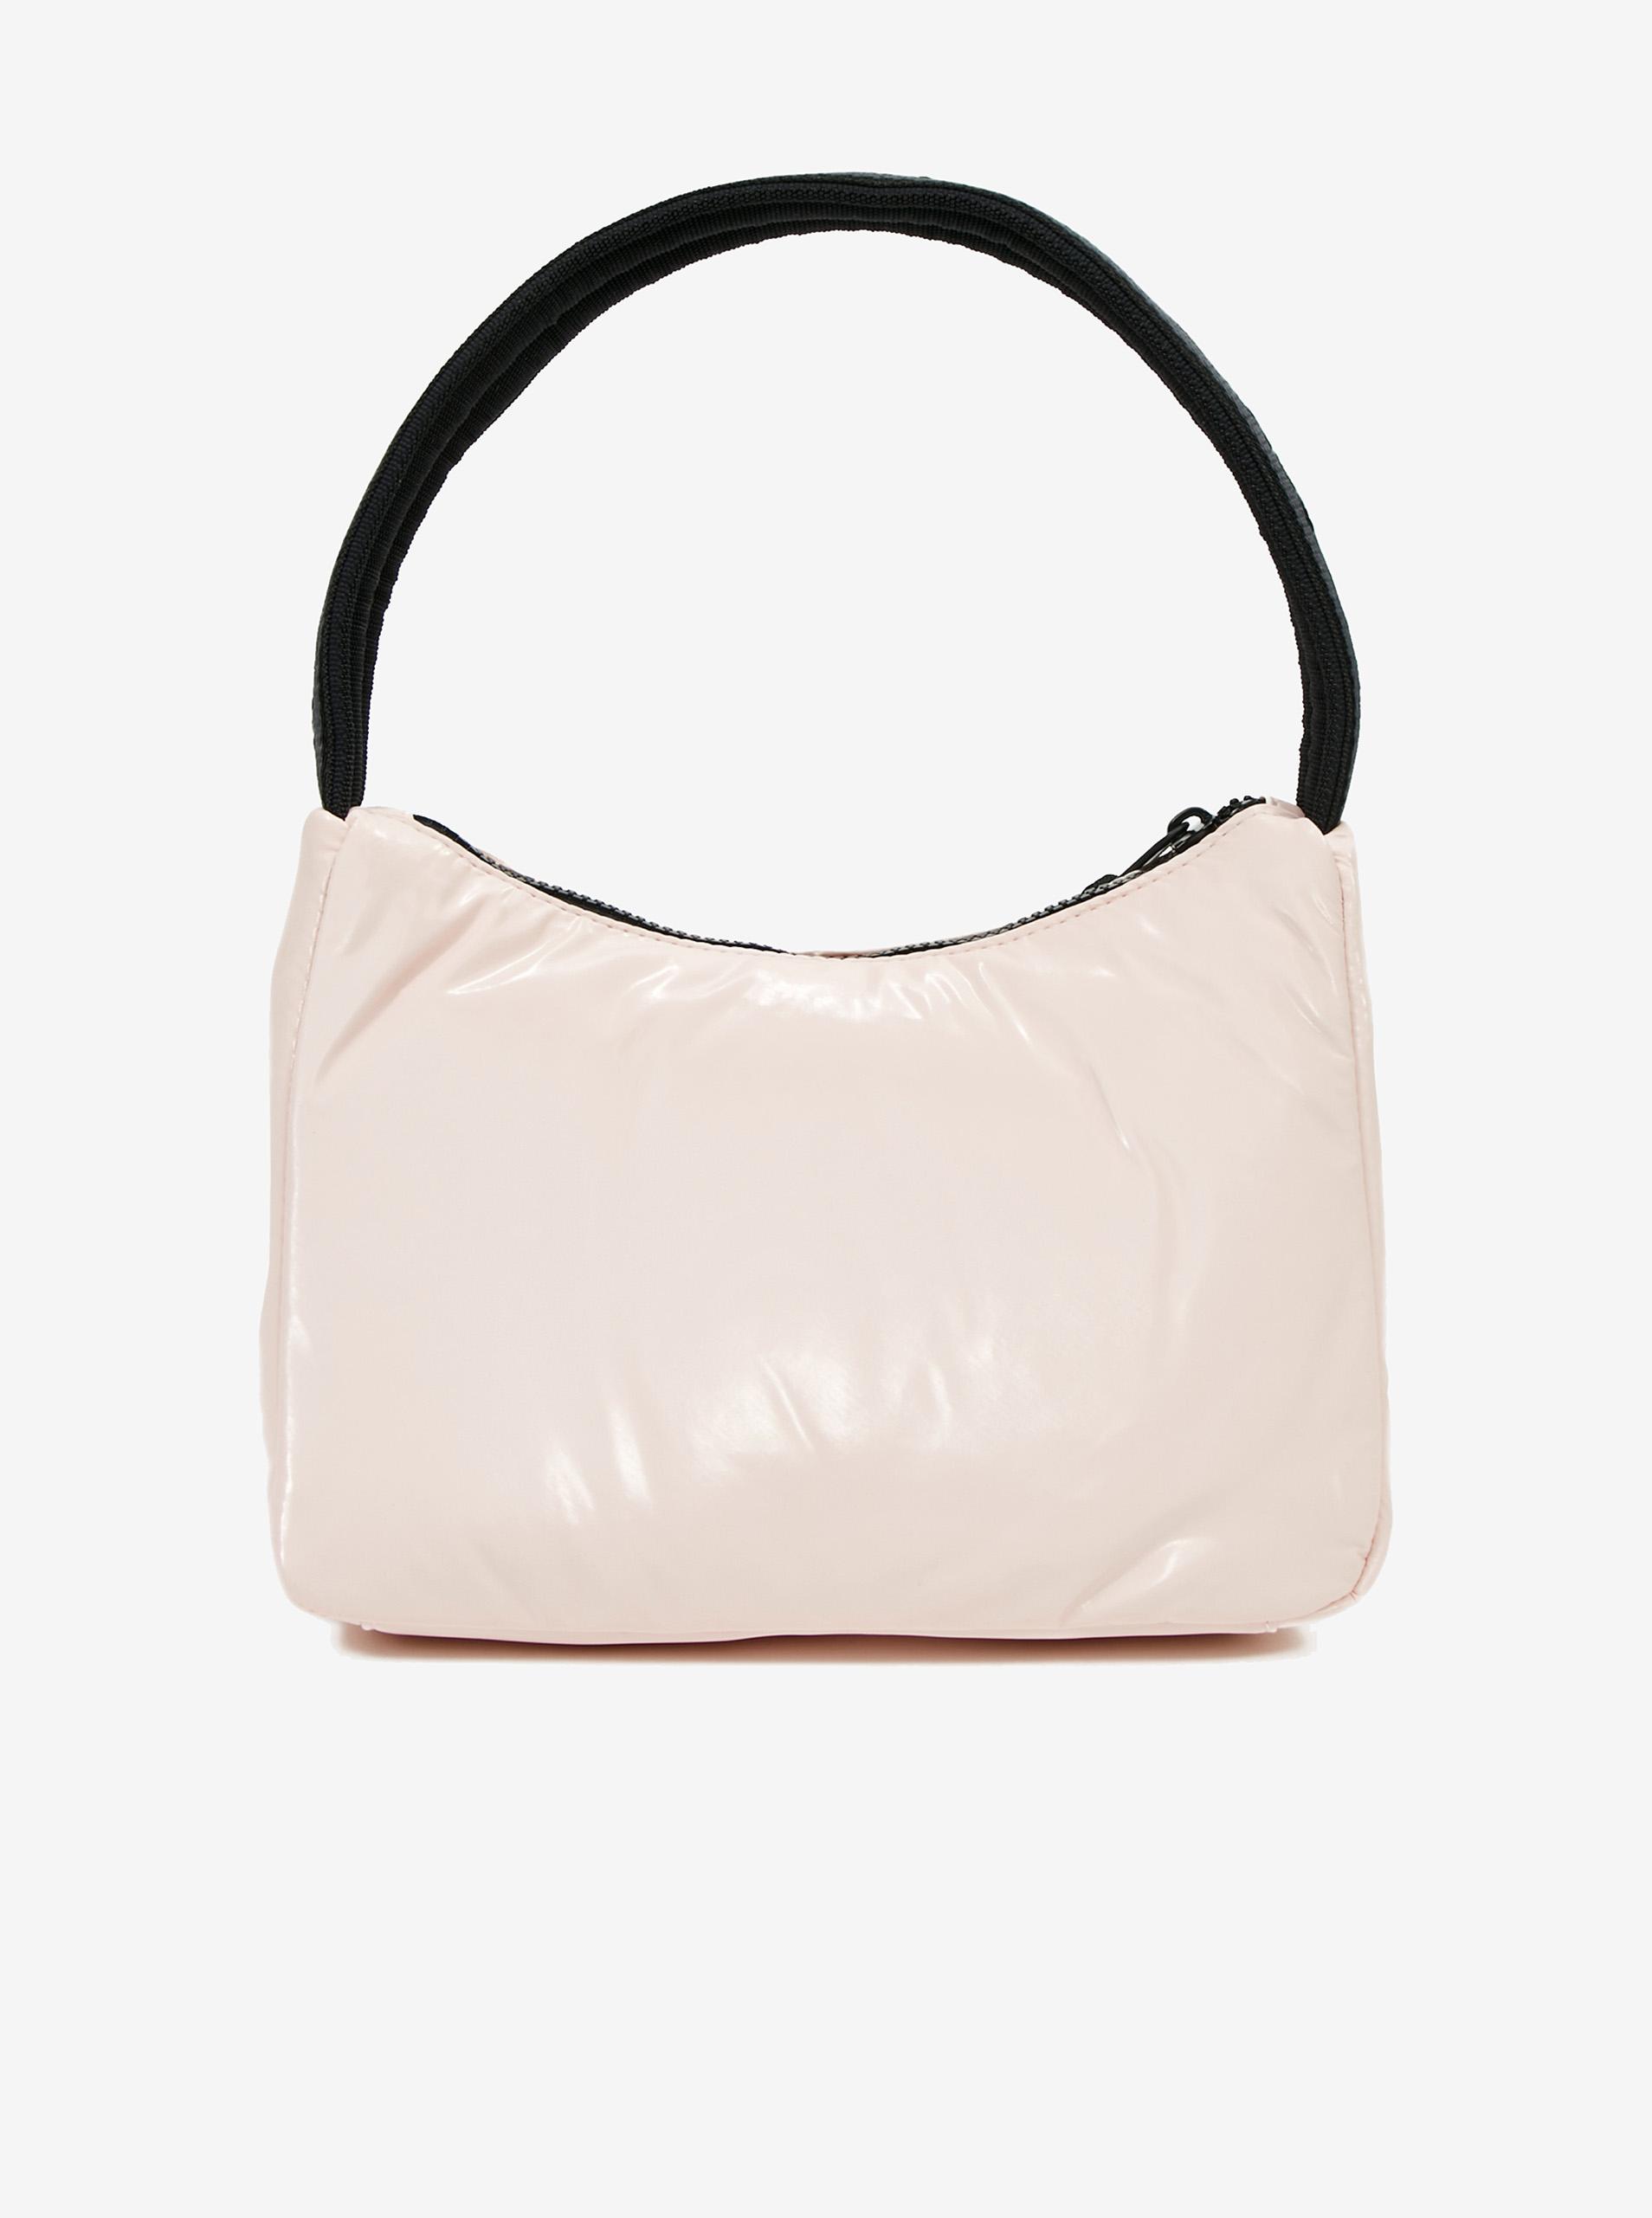 Tommy Hilfiger różowy torebka